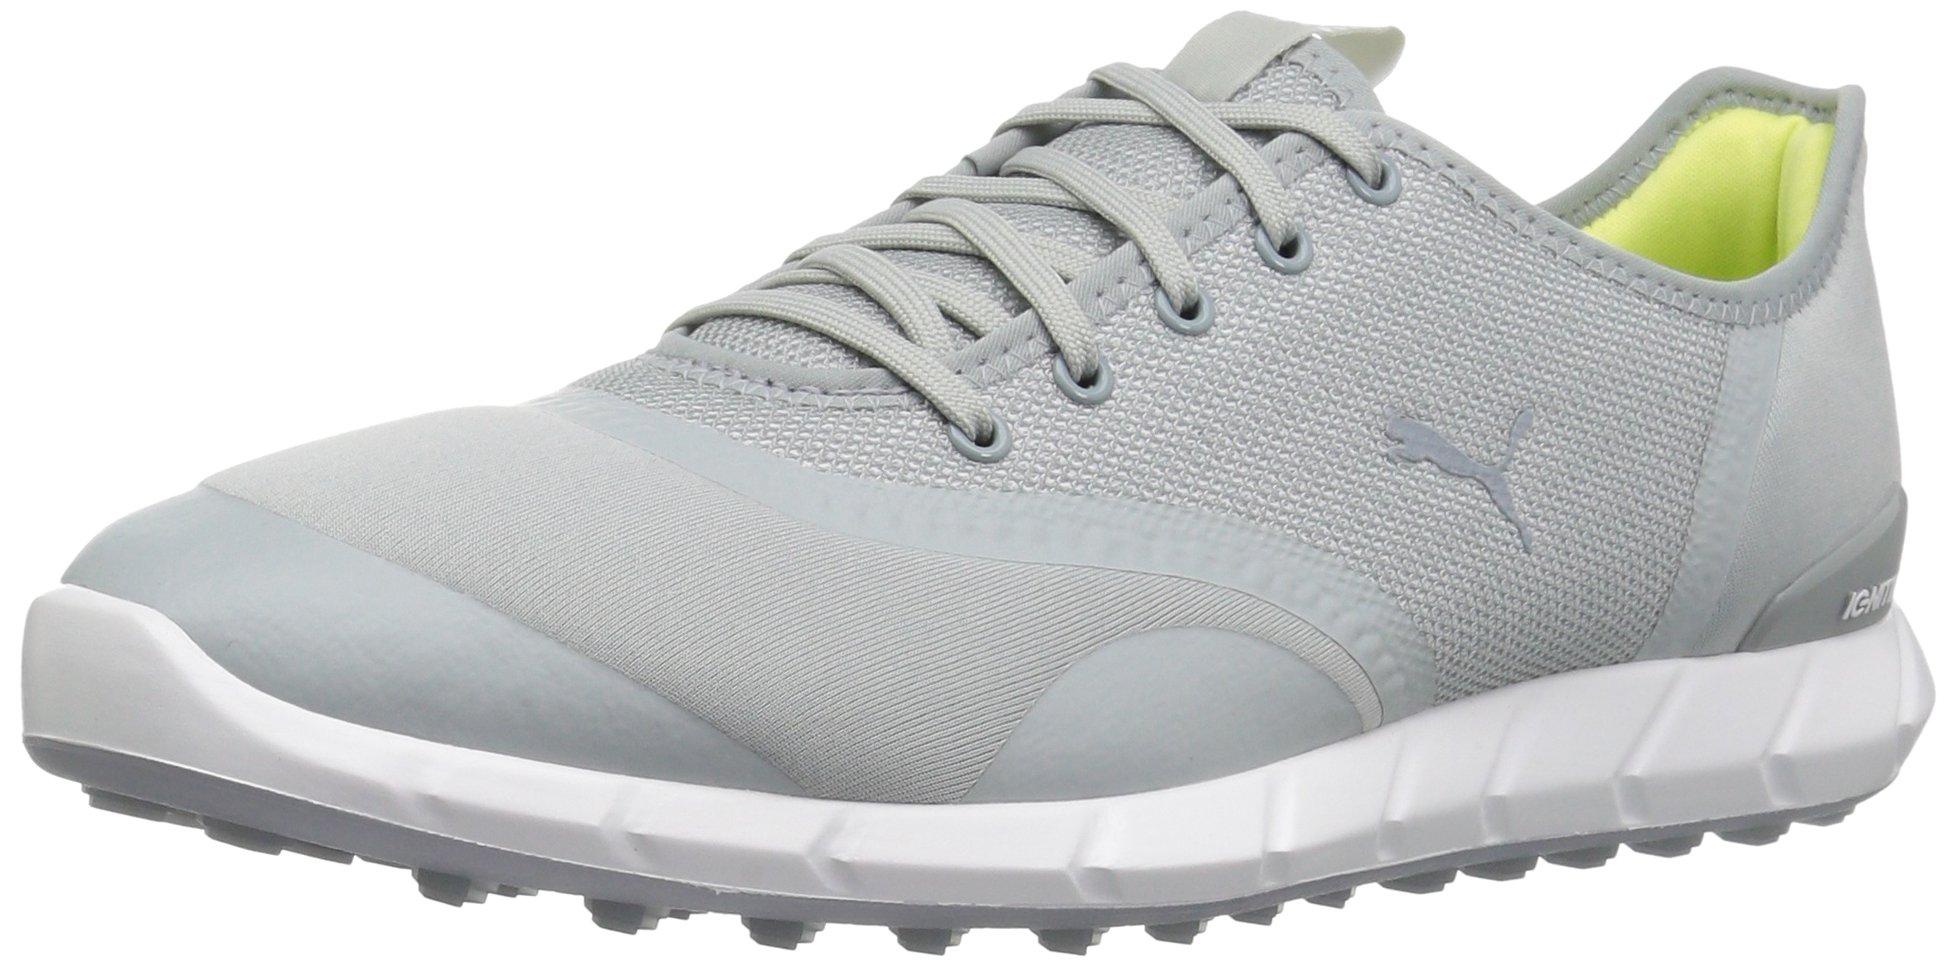 PUMA Golf Women's Ignite Statement Low Golf Shoe, Quarry/White, 8.5 Medium US